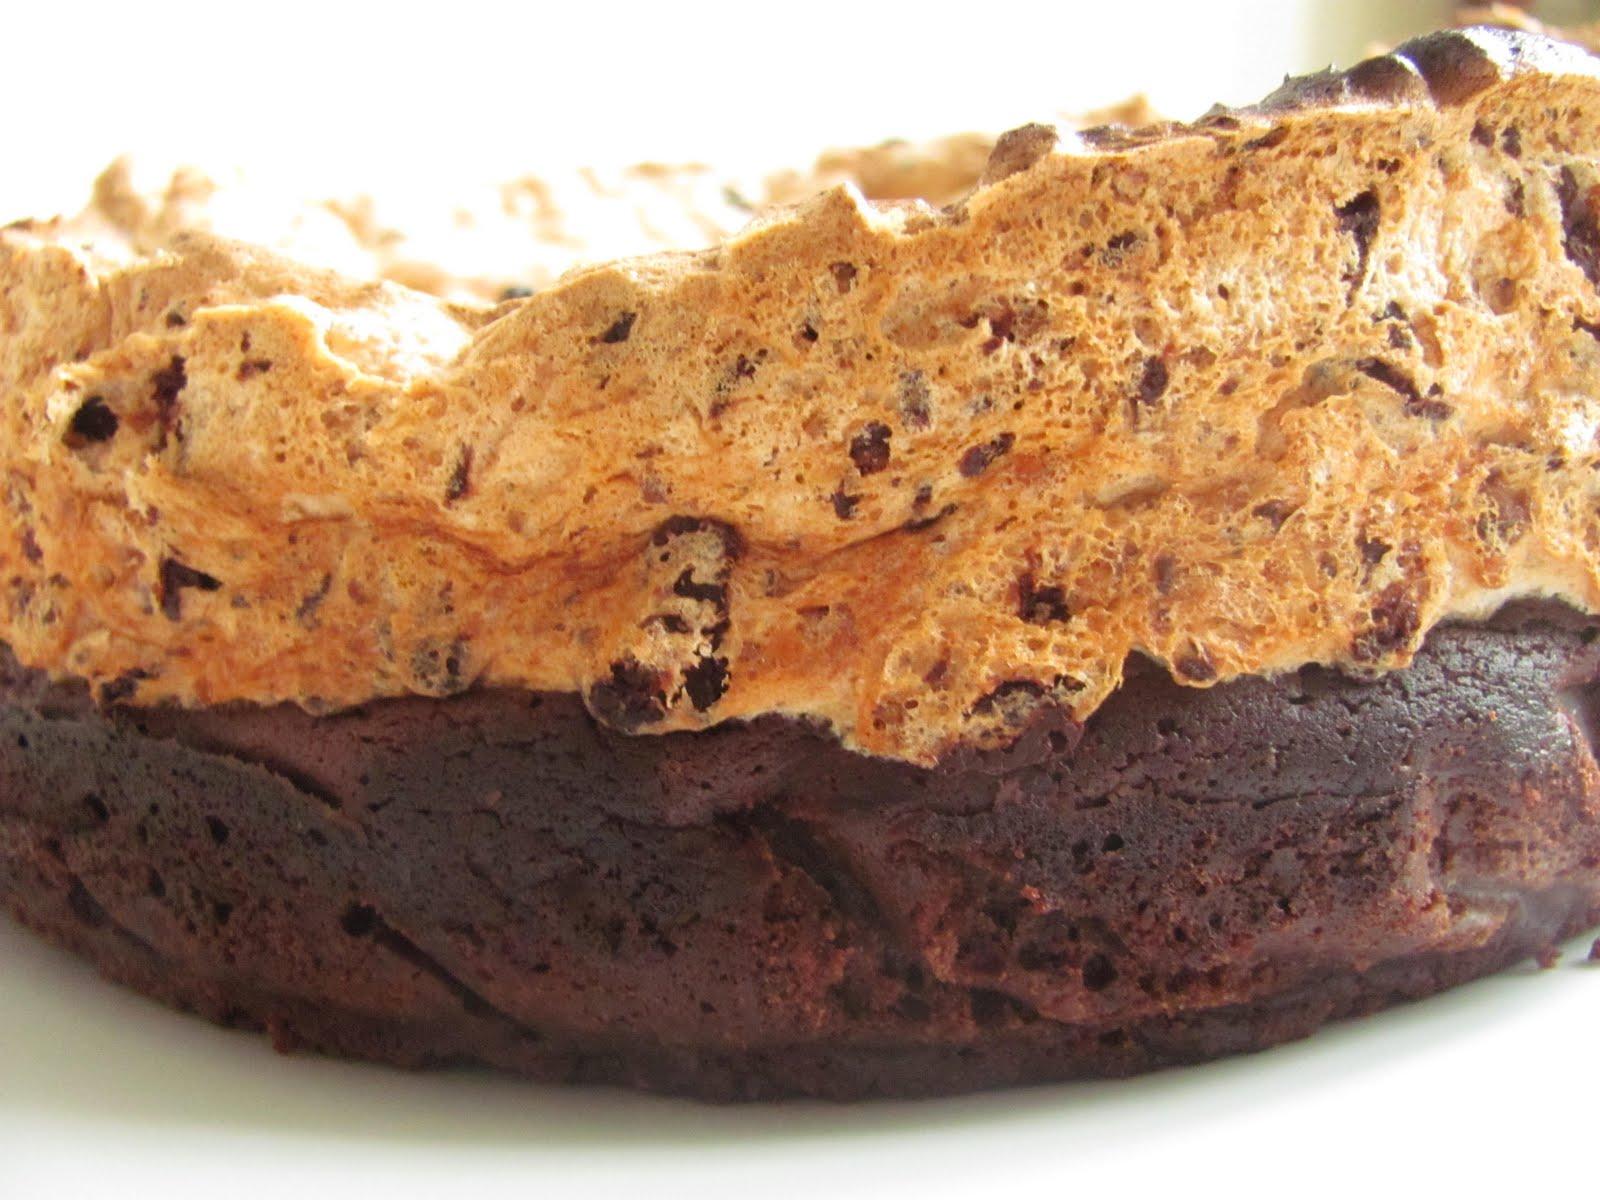 ... the Kitchen 'Splorer: Chocolate and hazelnut meringue birthday cake